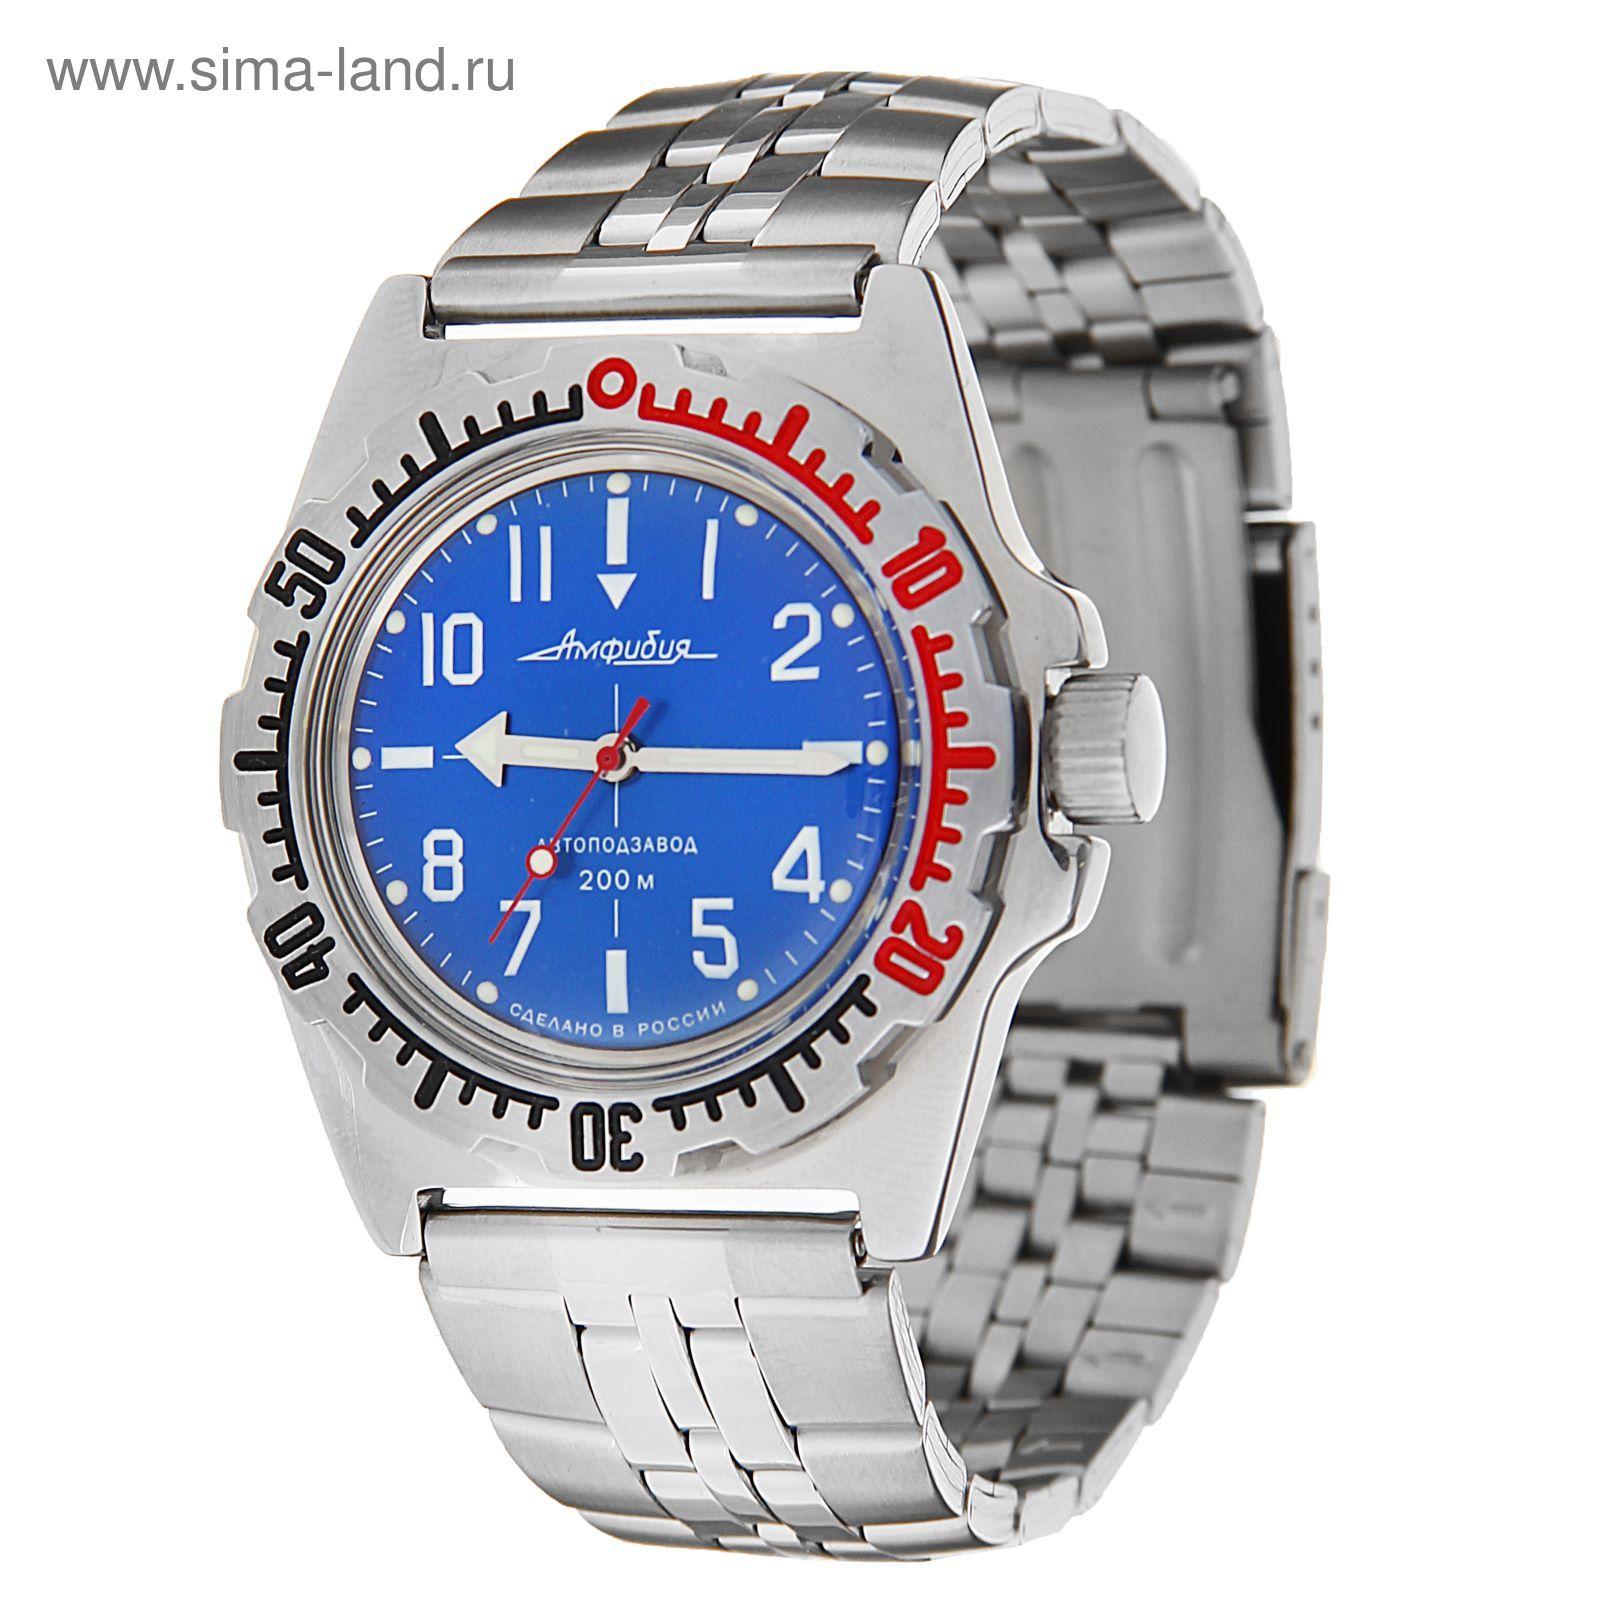 Цена на наручные мужские часы амфибия часы наручные мужские daniel wellington